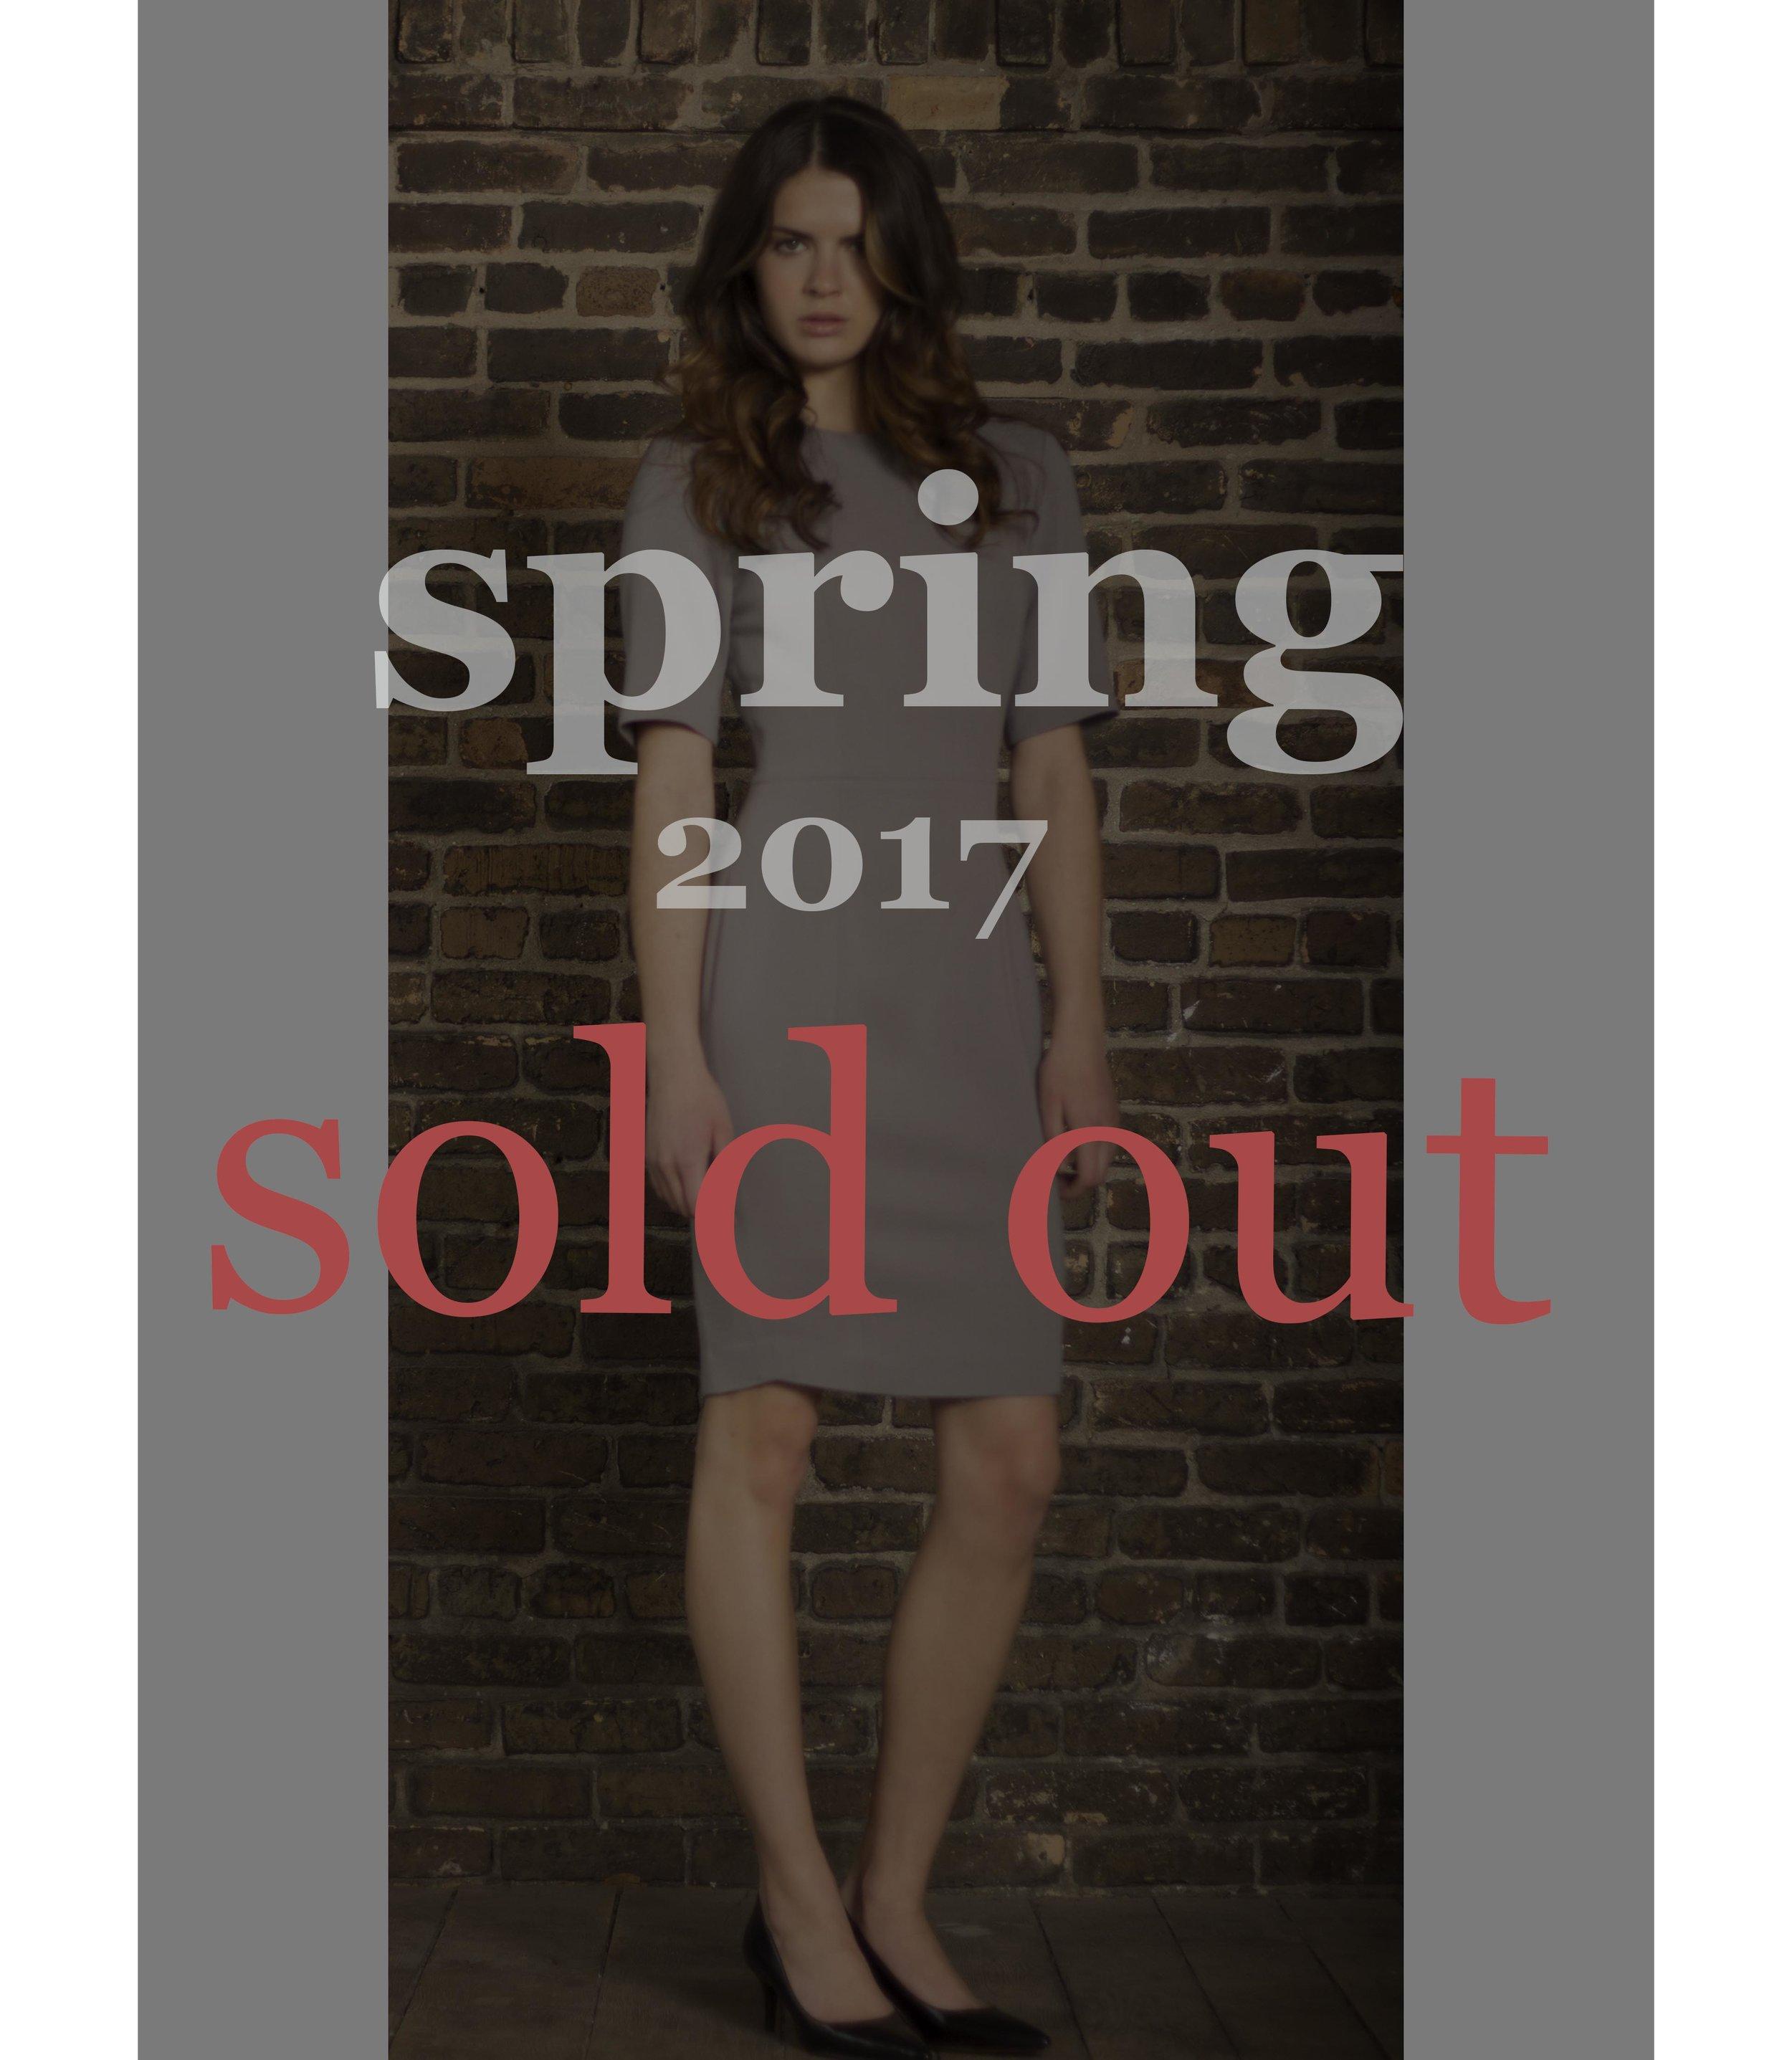 spring_2017_soldout.jpg